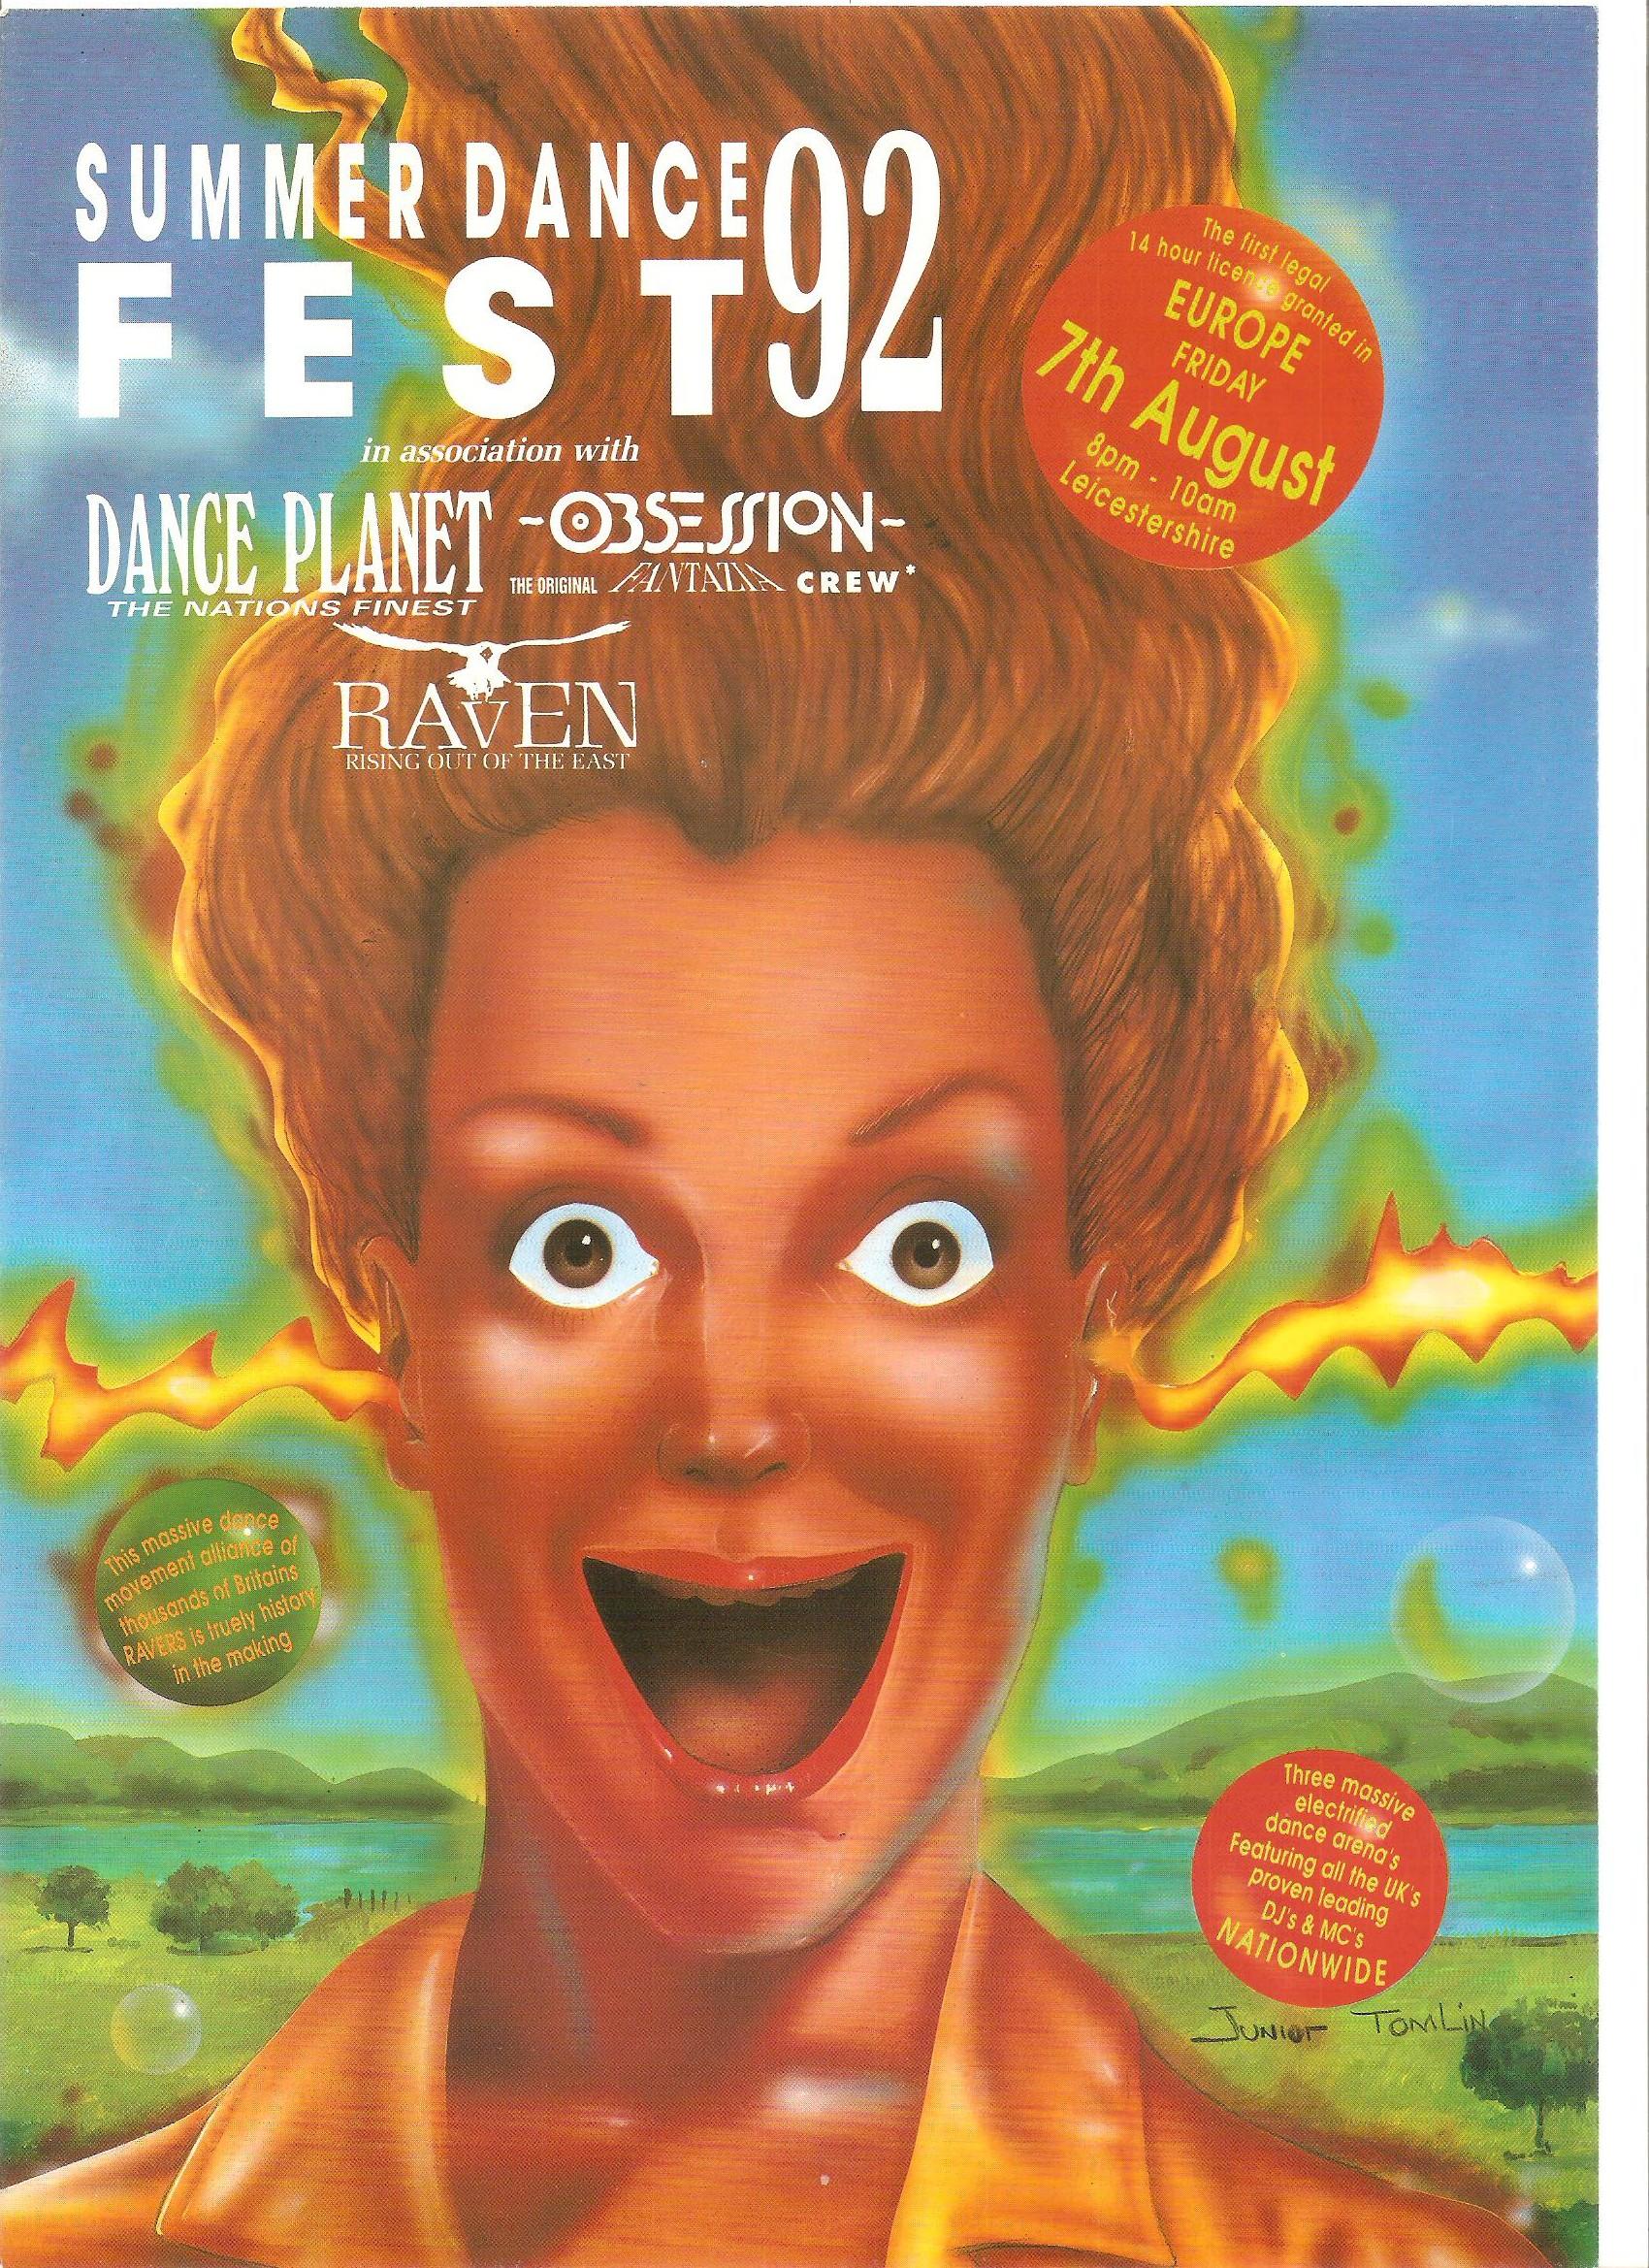 summer-dance-fest-92-front